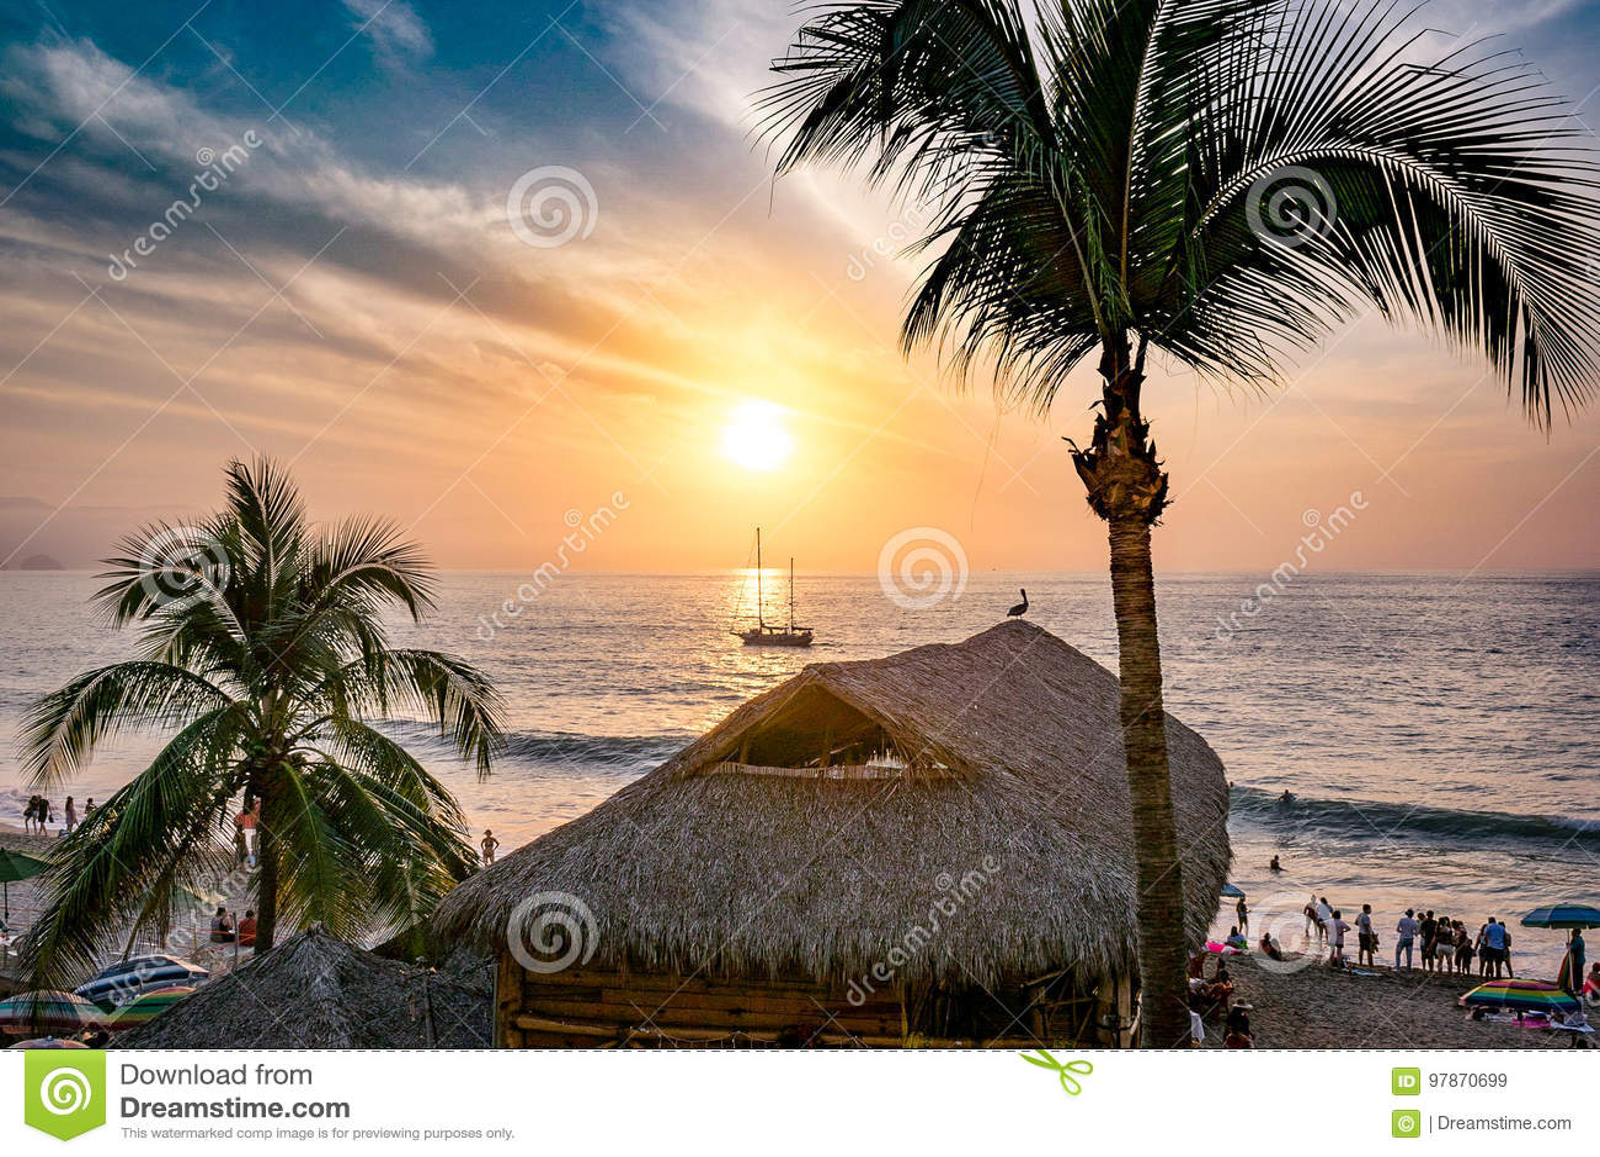 Puerto Vallarta Beach sunset ocean coconut trees boat